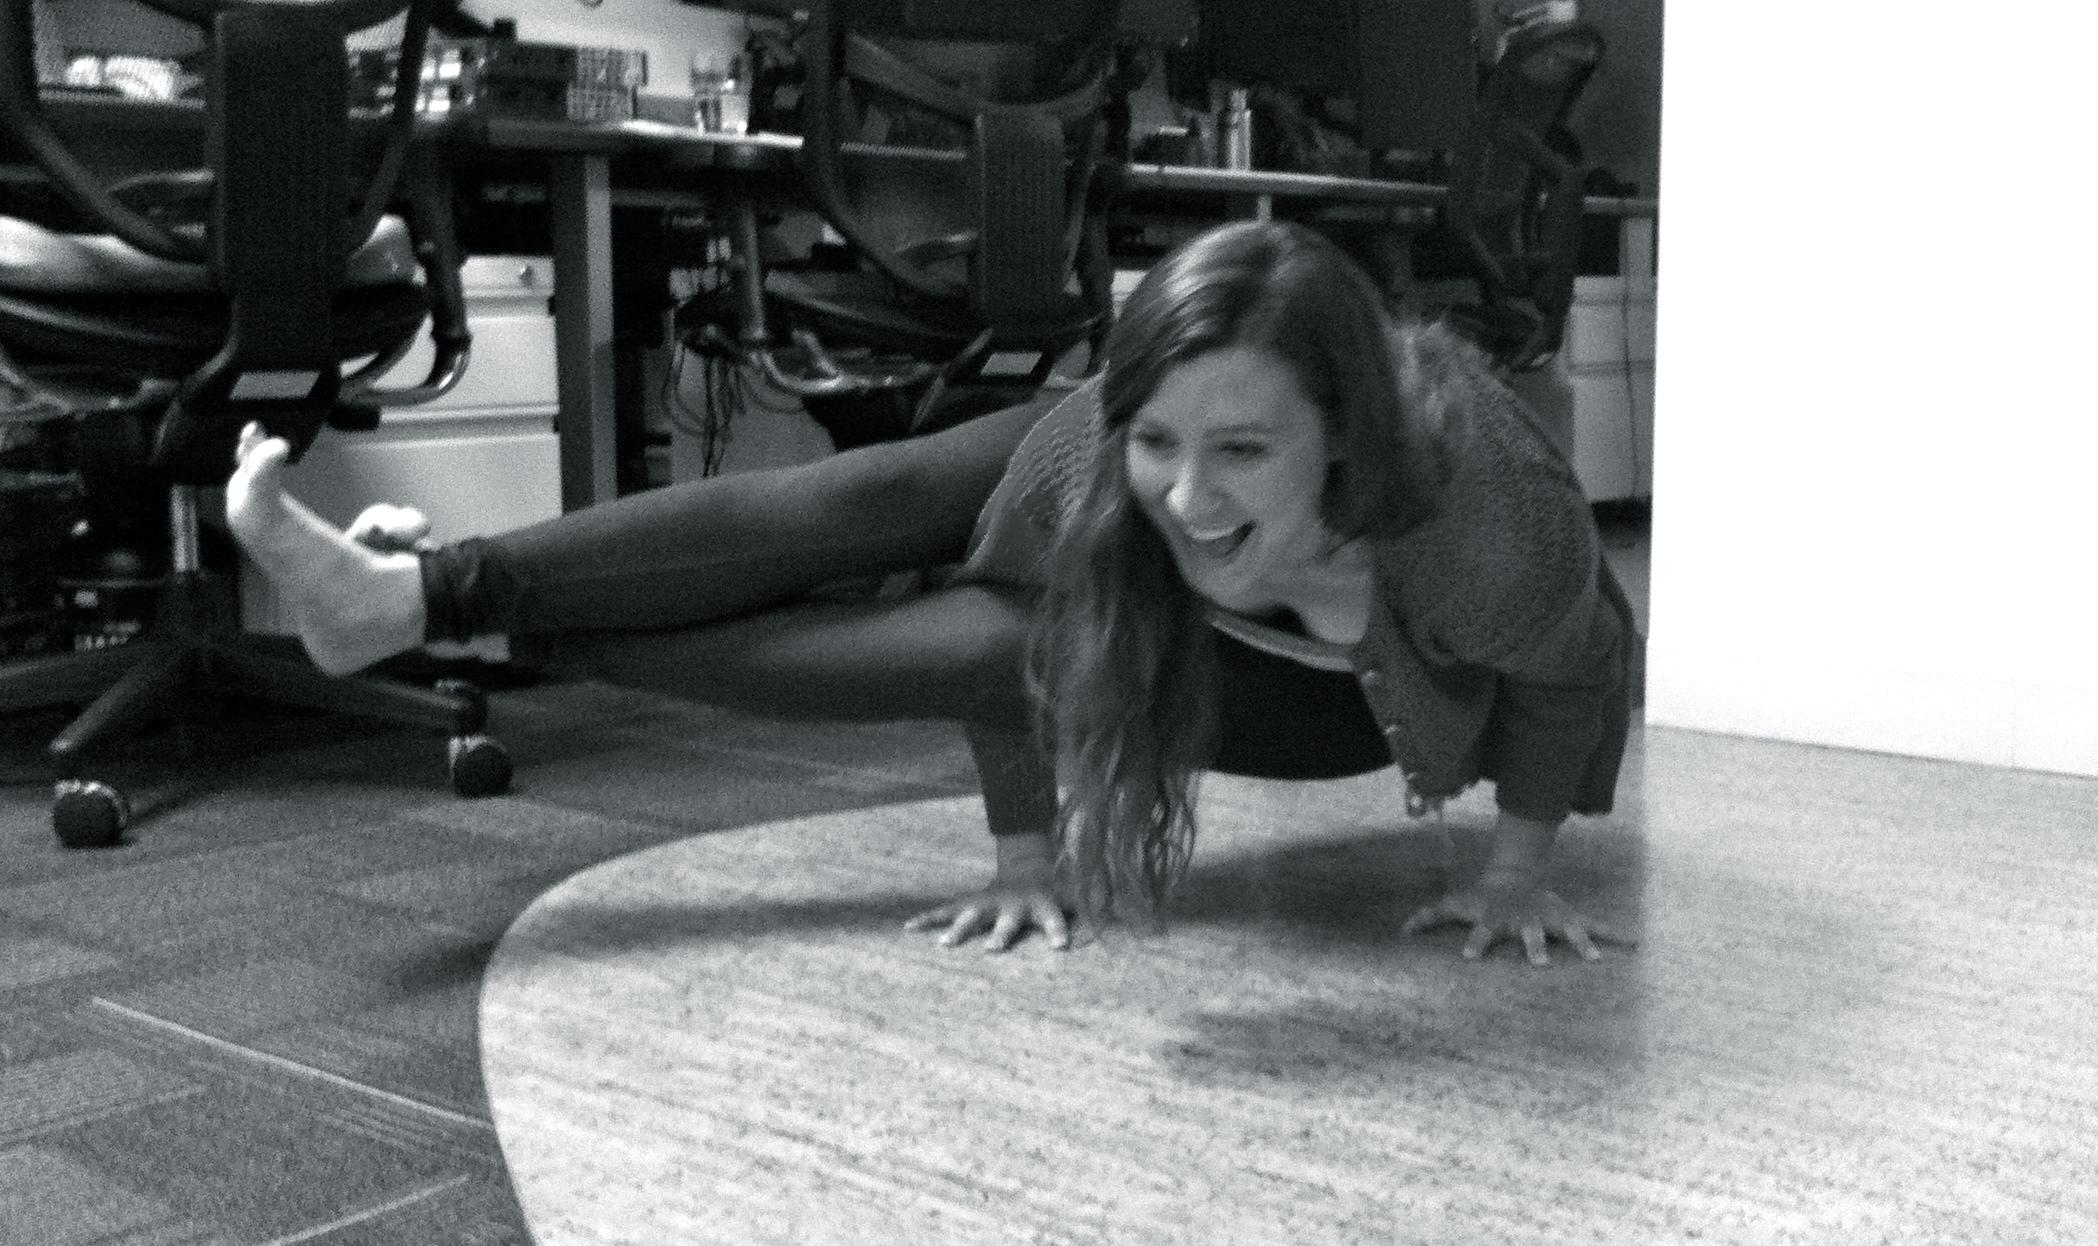 Yoga, at work